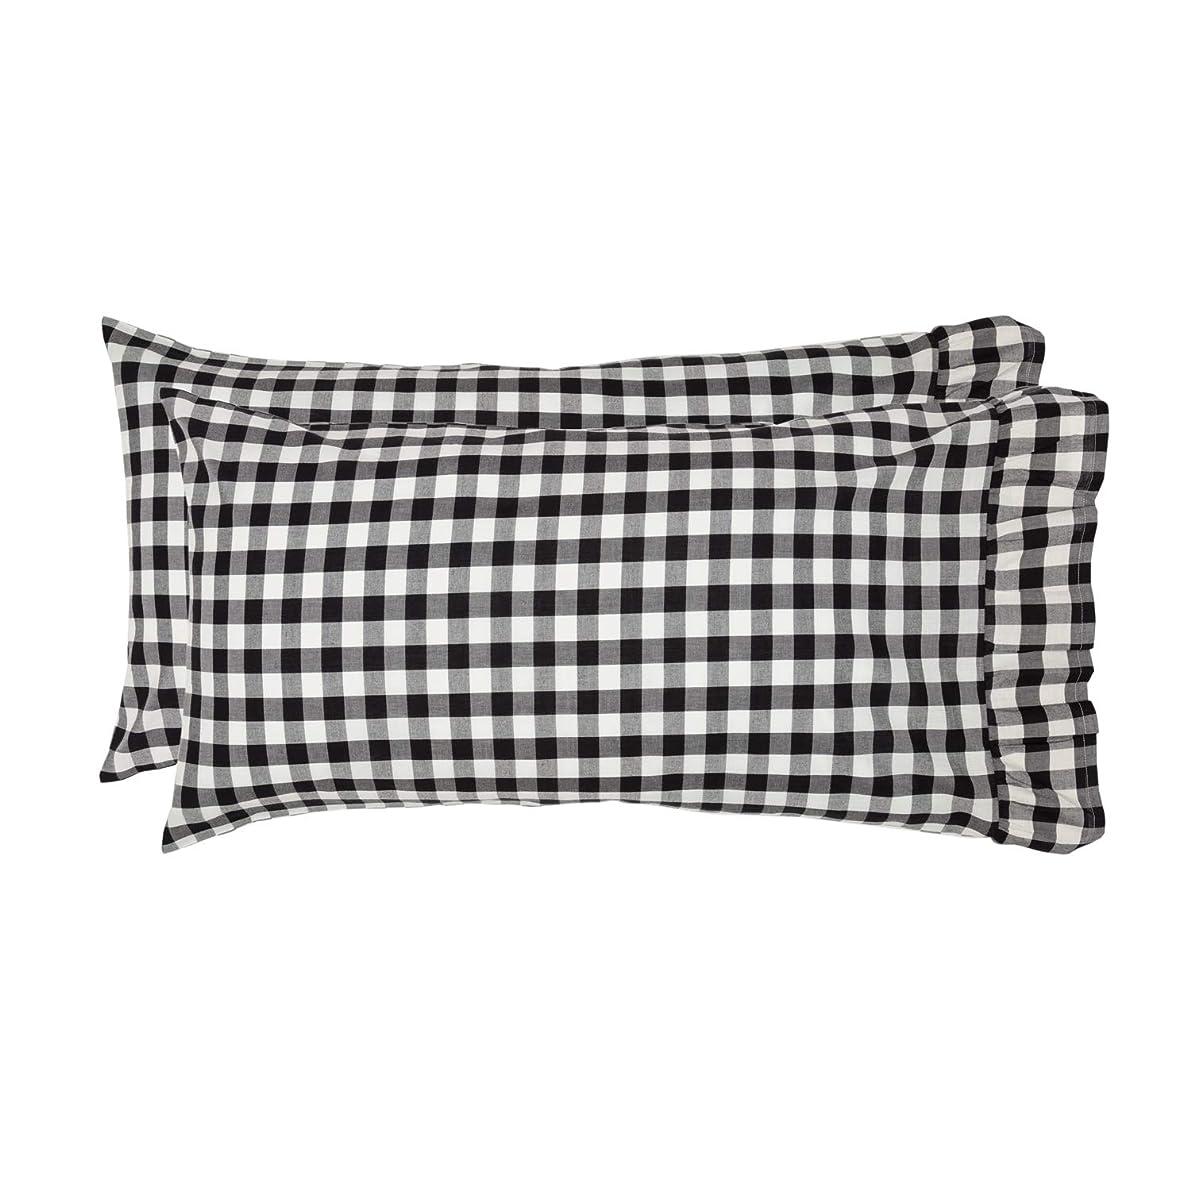 VHC Brands Farmhouse Bedding Annie Cotton Buffalo Check King Pillow Case Set of 2 Black Country